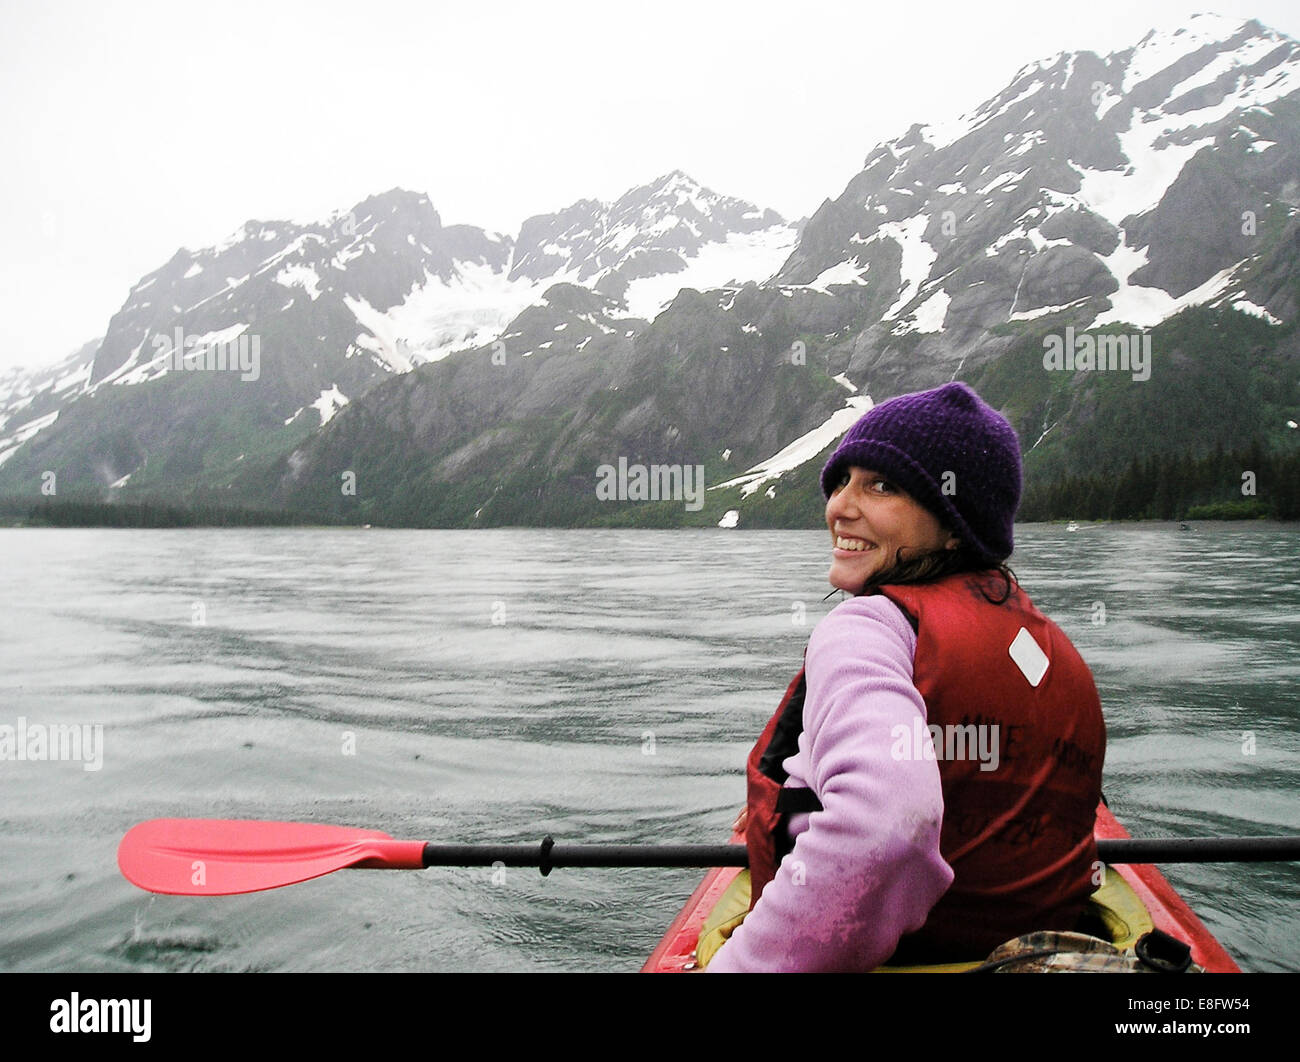 Woman kayaking near glaciers in Kenai Fjords National park, Alaksa, America, USA - Stock Image